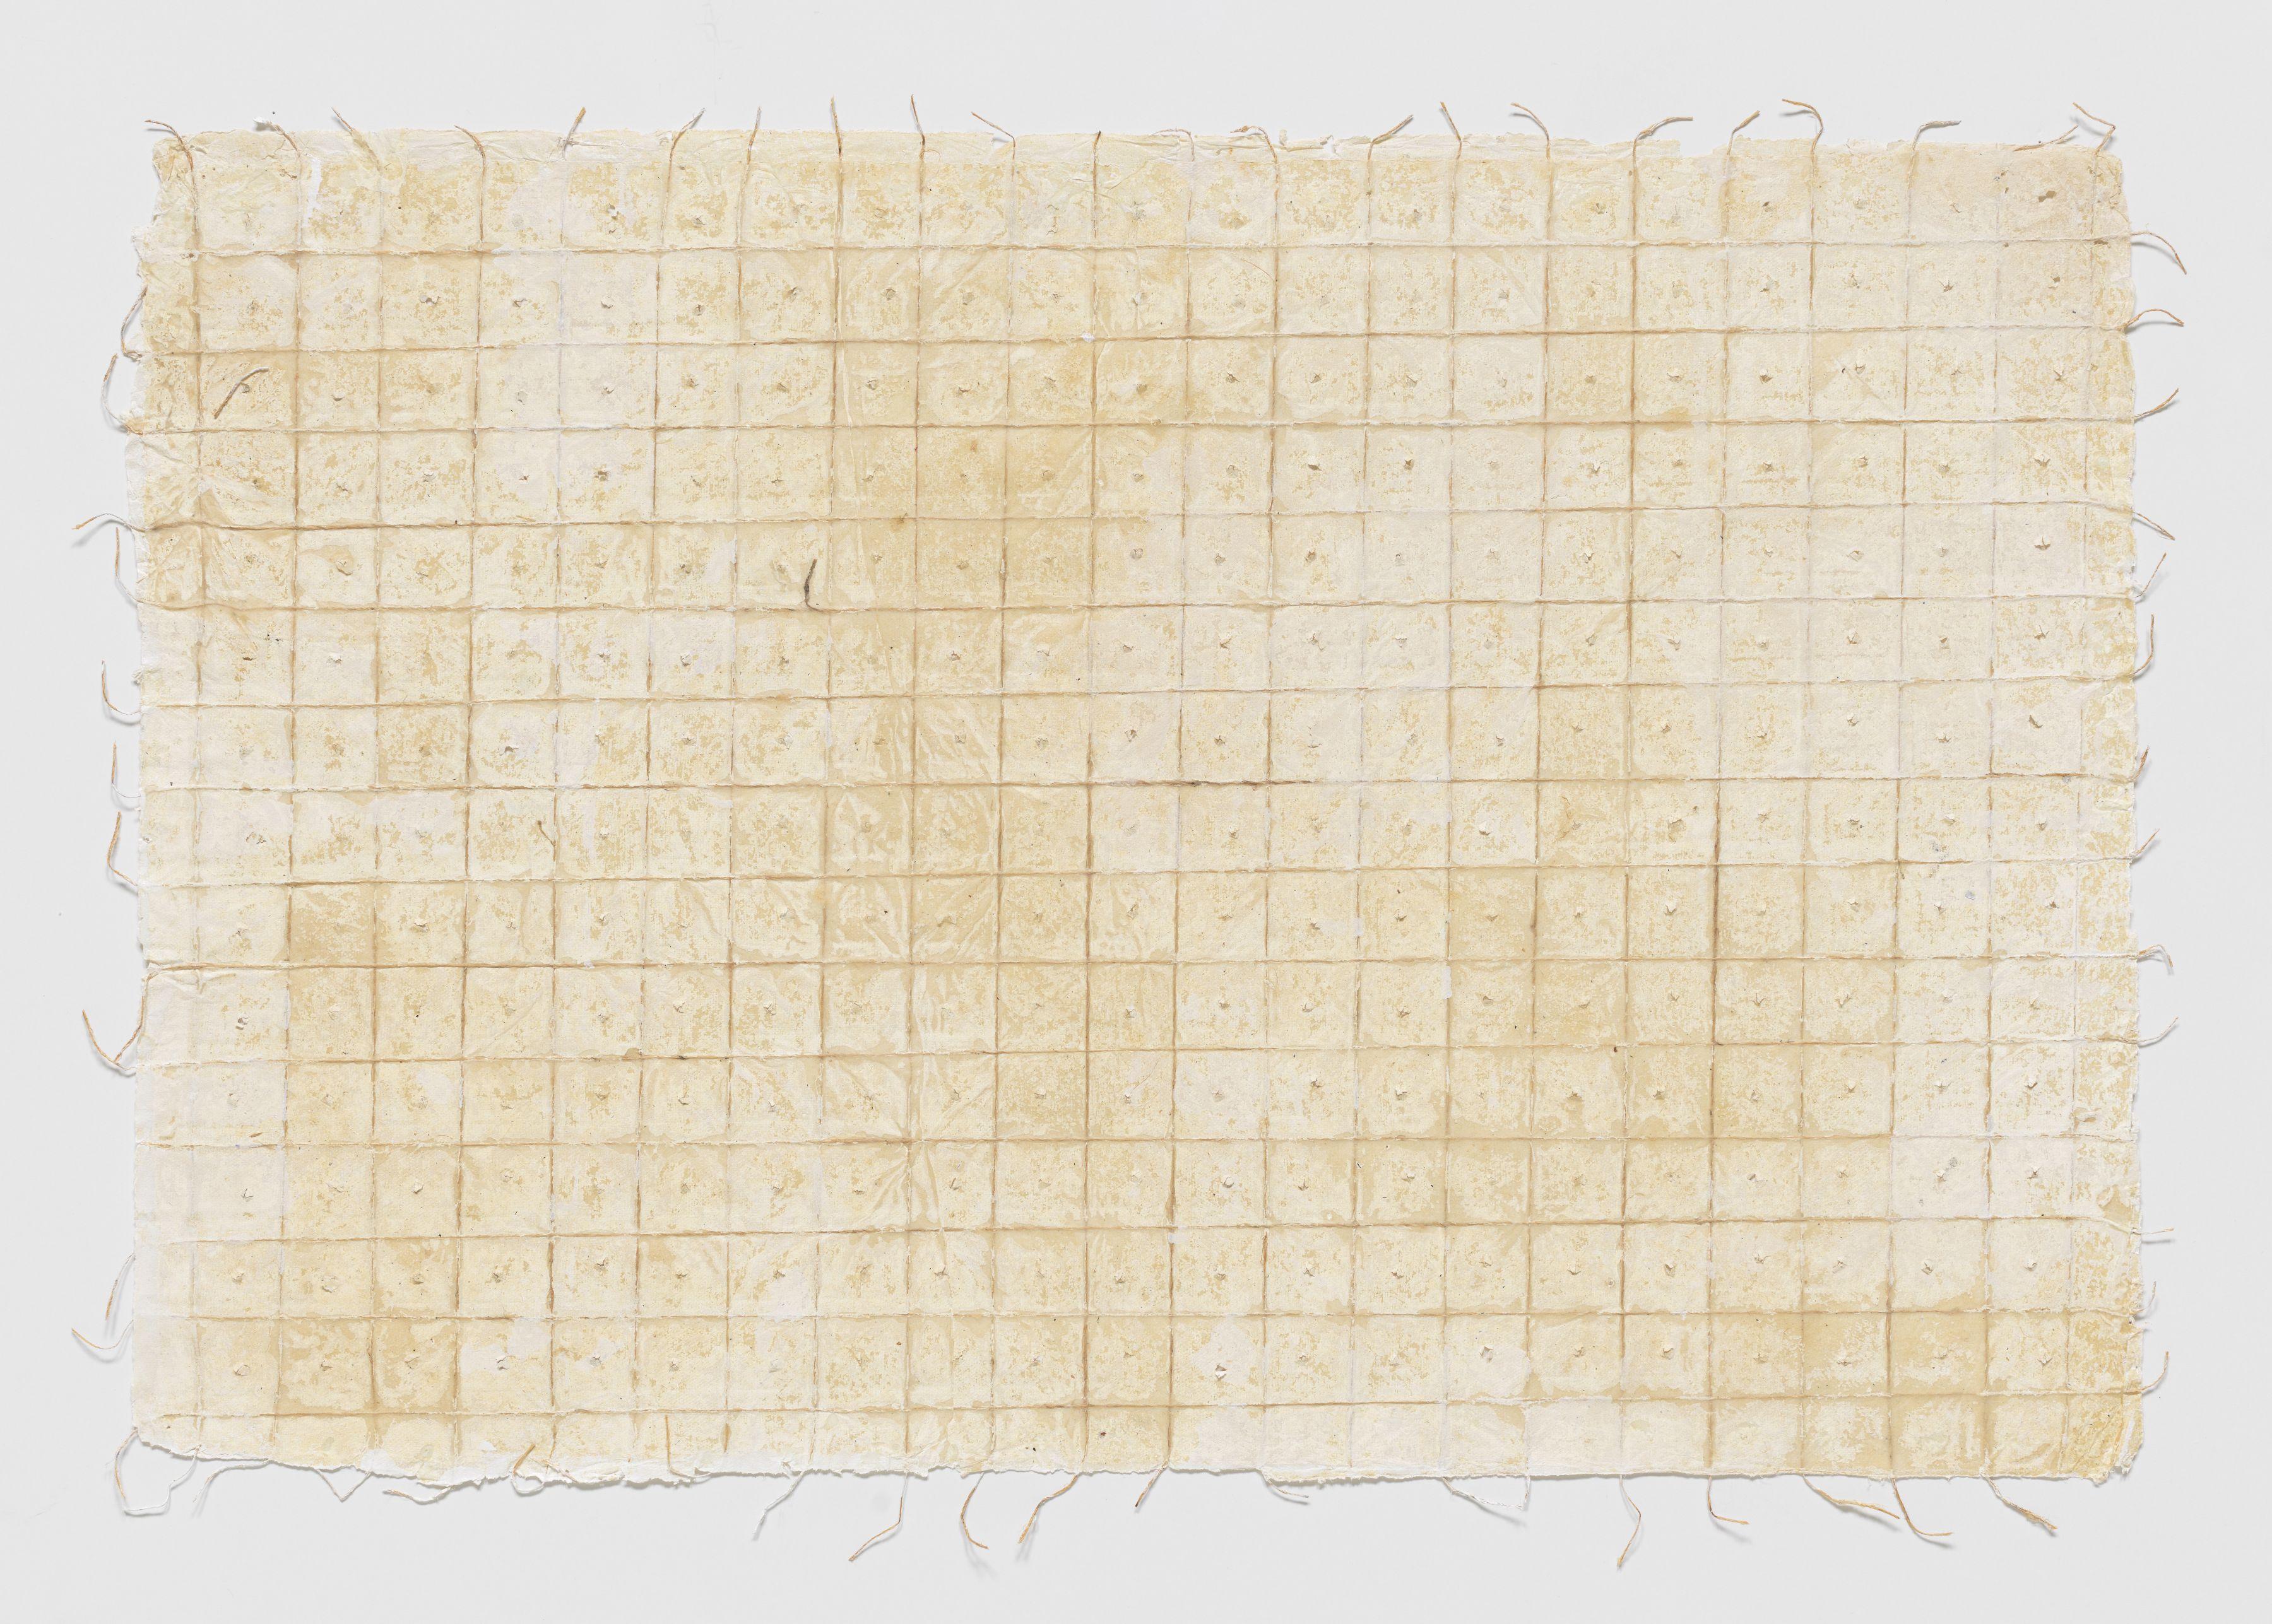 Extended Grid #2, 2017, Printing ink on handmade paper